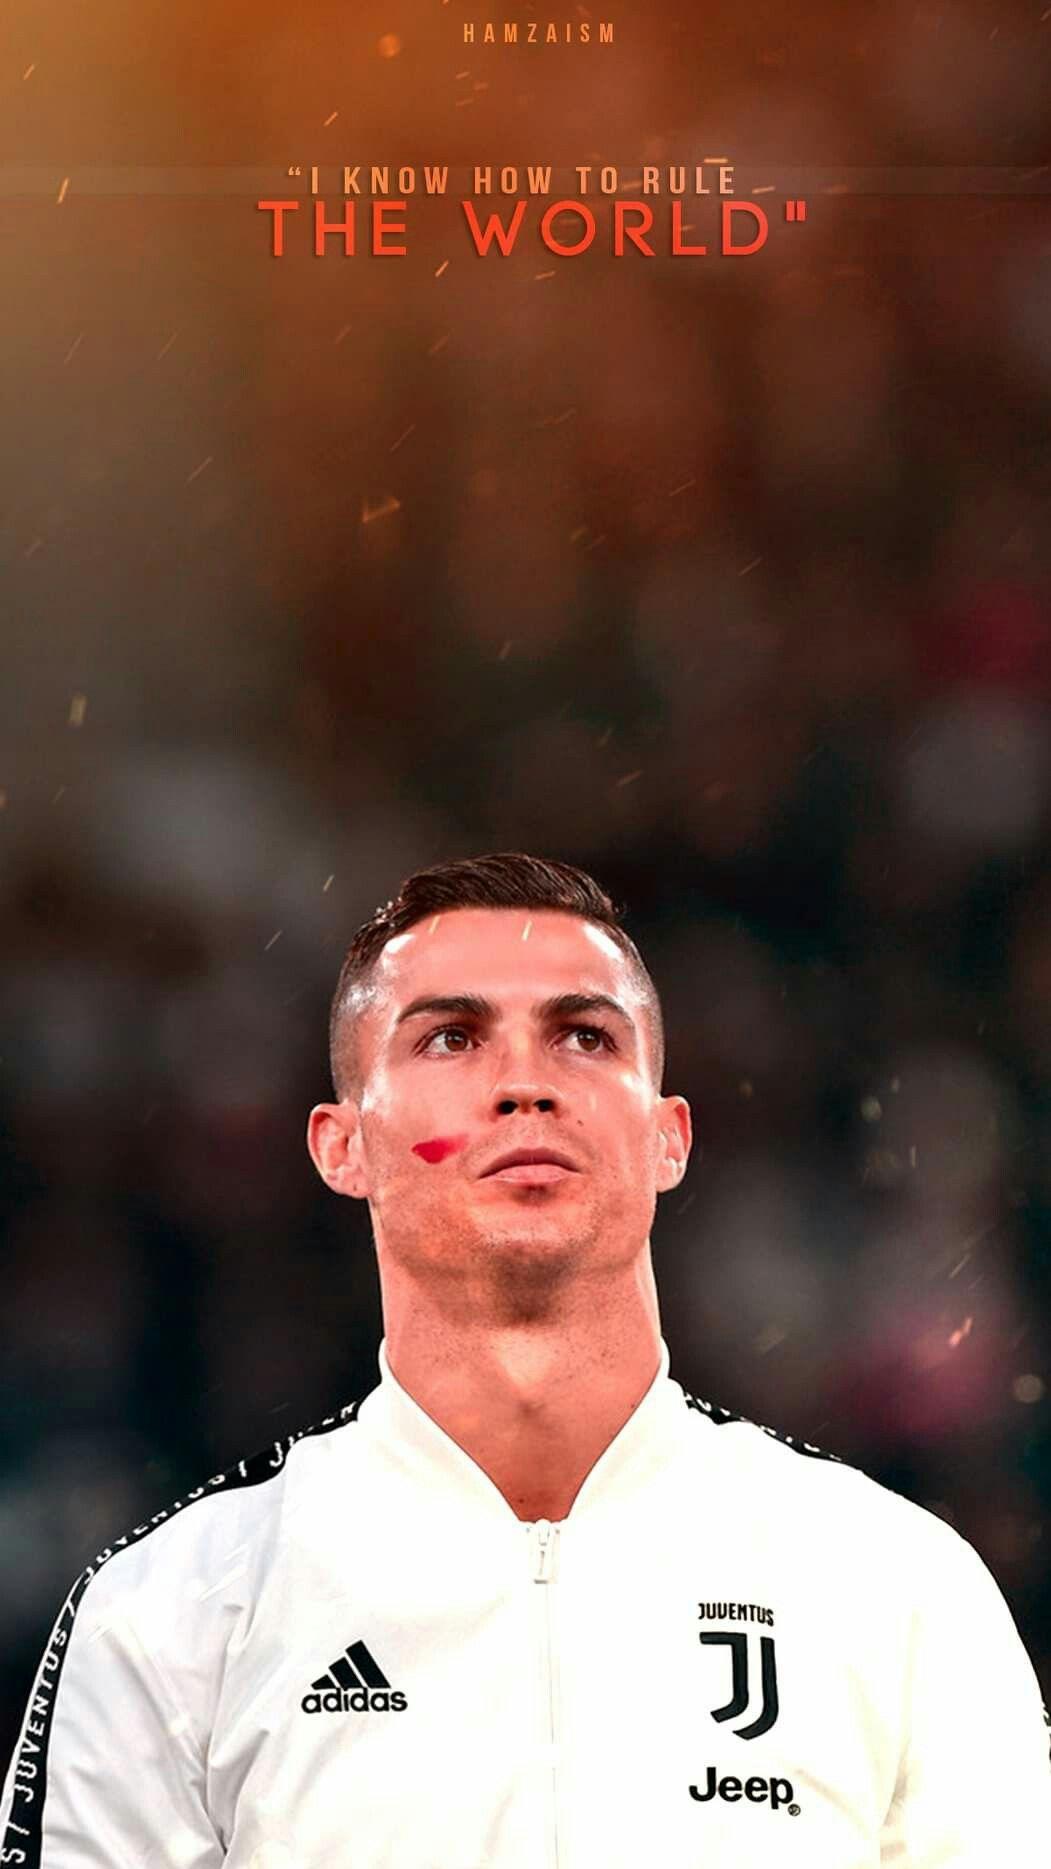 Cristiano Ronaldo Juventus Cristiano Ronaldo Cristiano Ronaldo Juventus Ronaldo Juventus